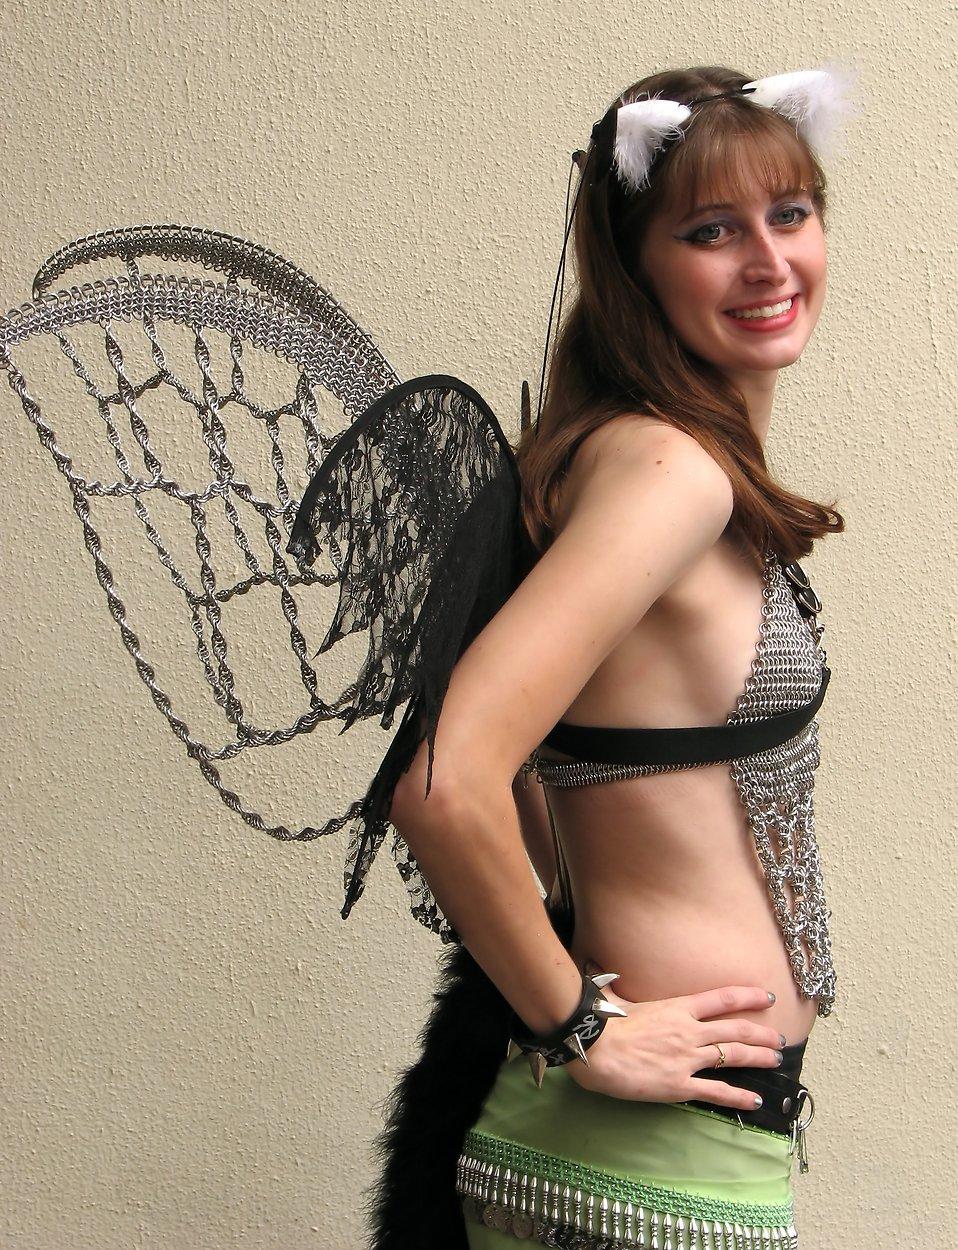 A beautiful girl in a fairy cat costume at Dragoncon 2009 in Atlanta, Georgia : Free Stock Photo